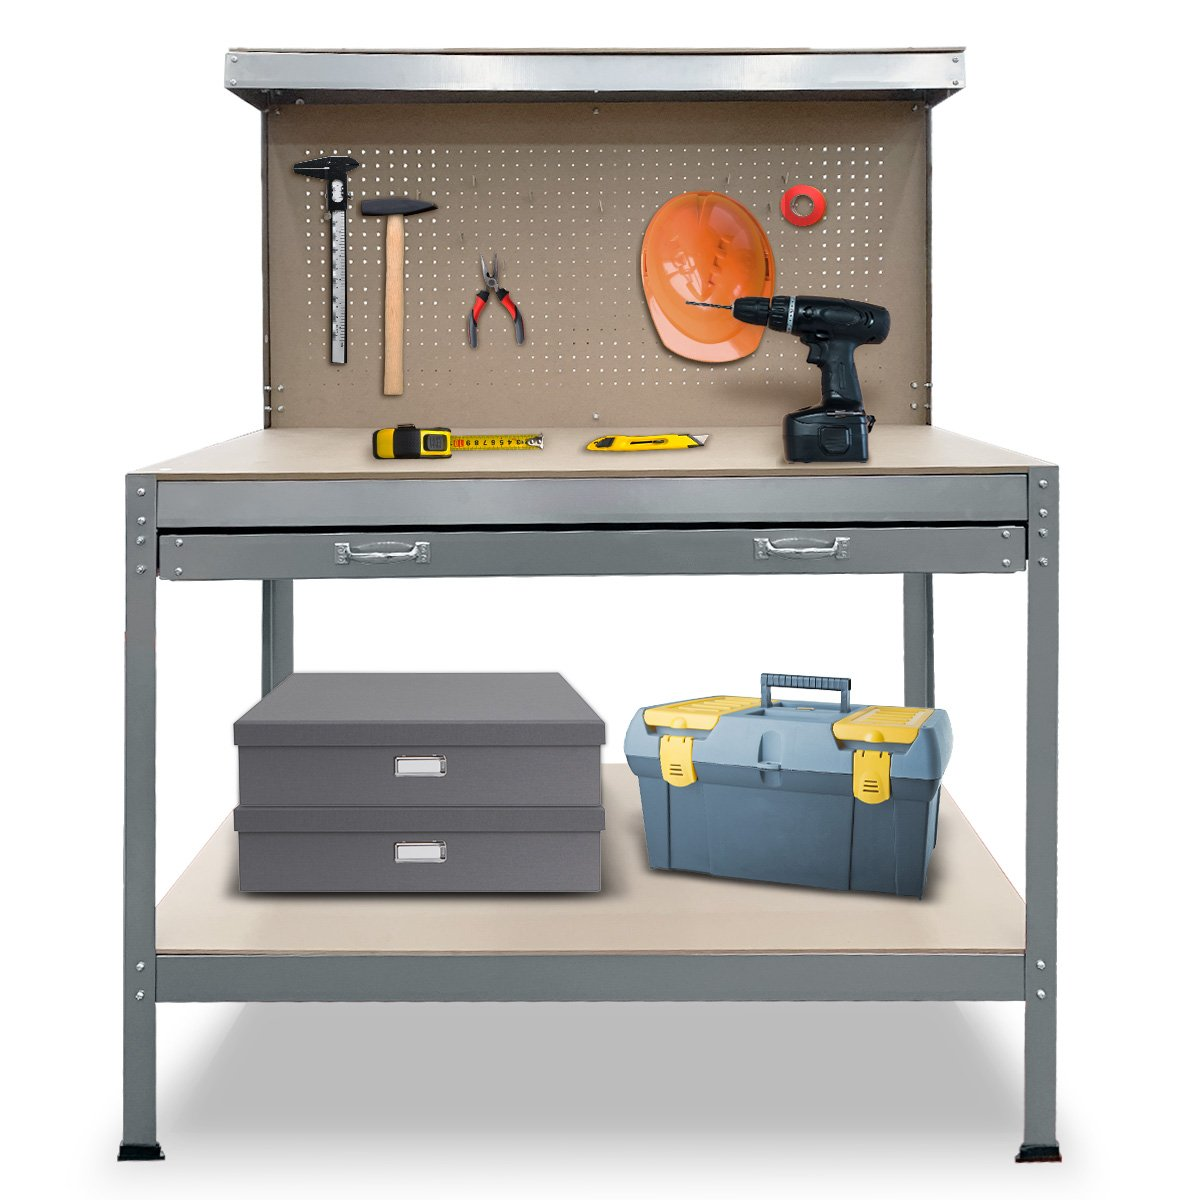 2-Layered Work Bench Garage Storage Table Tool Shop Shelf Silver - $240.9